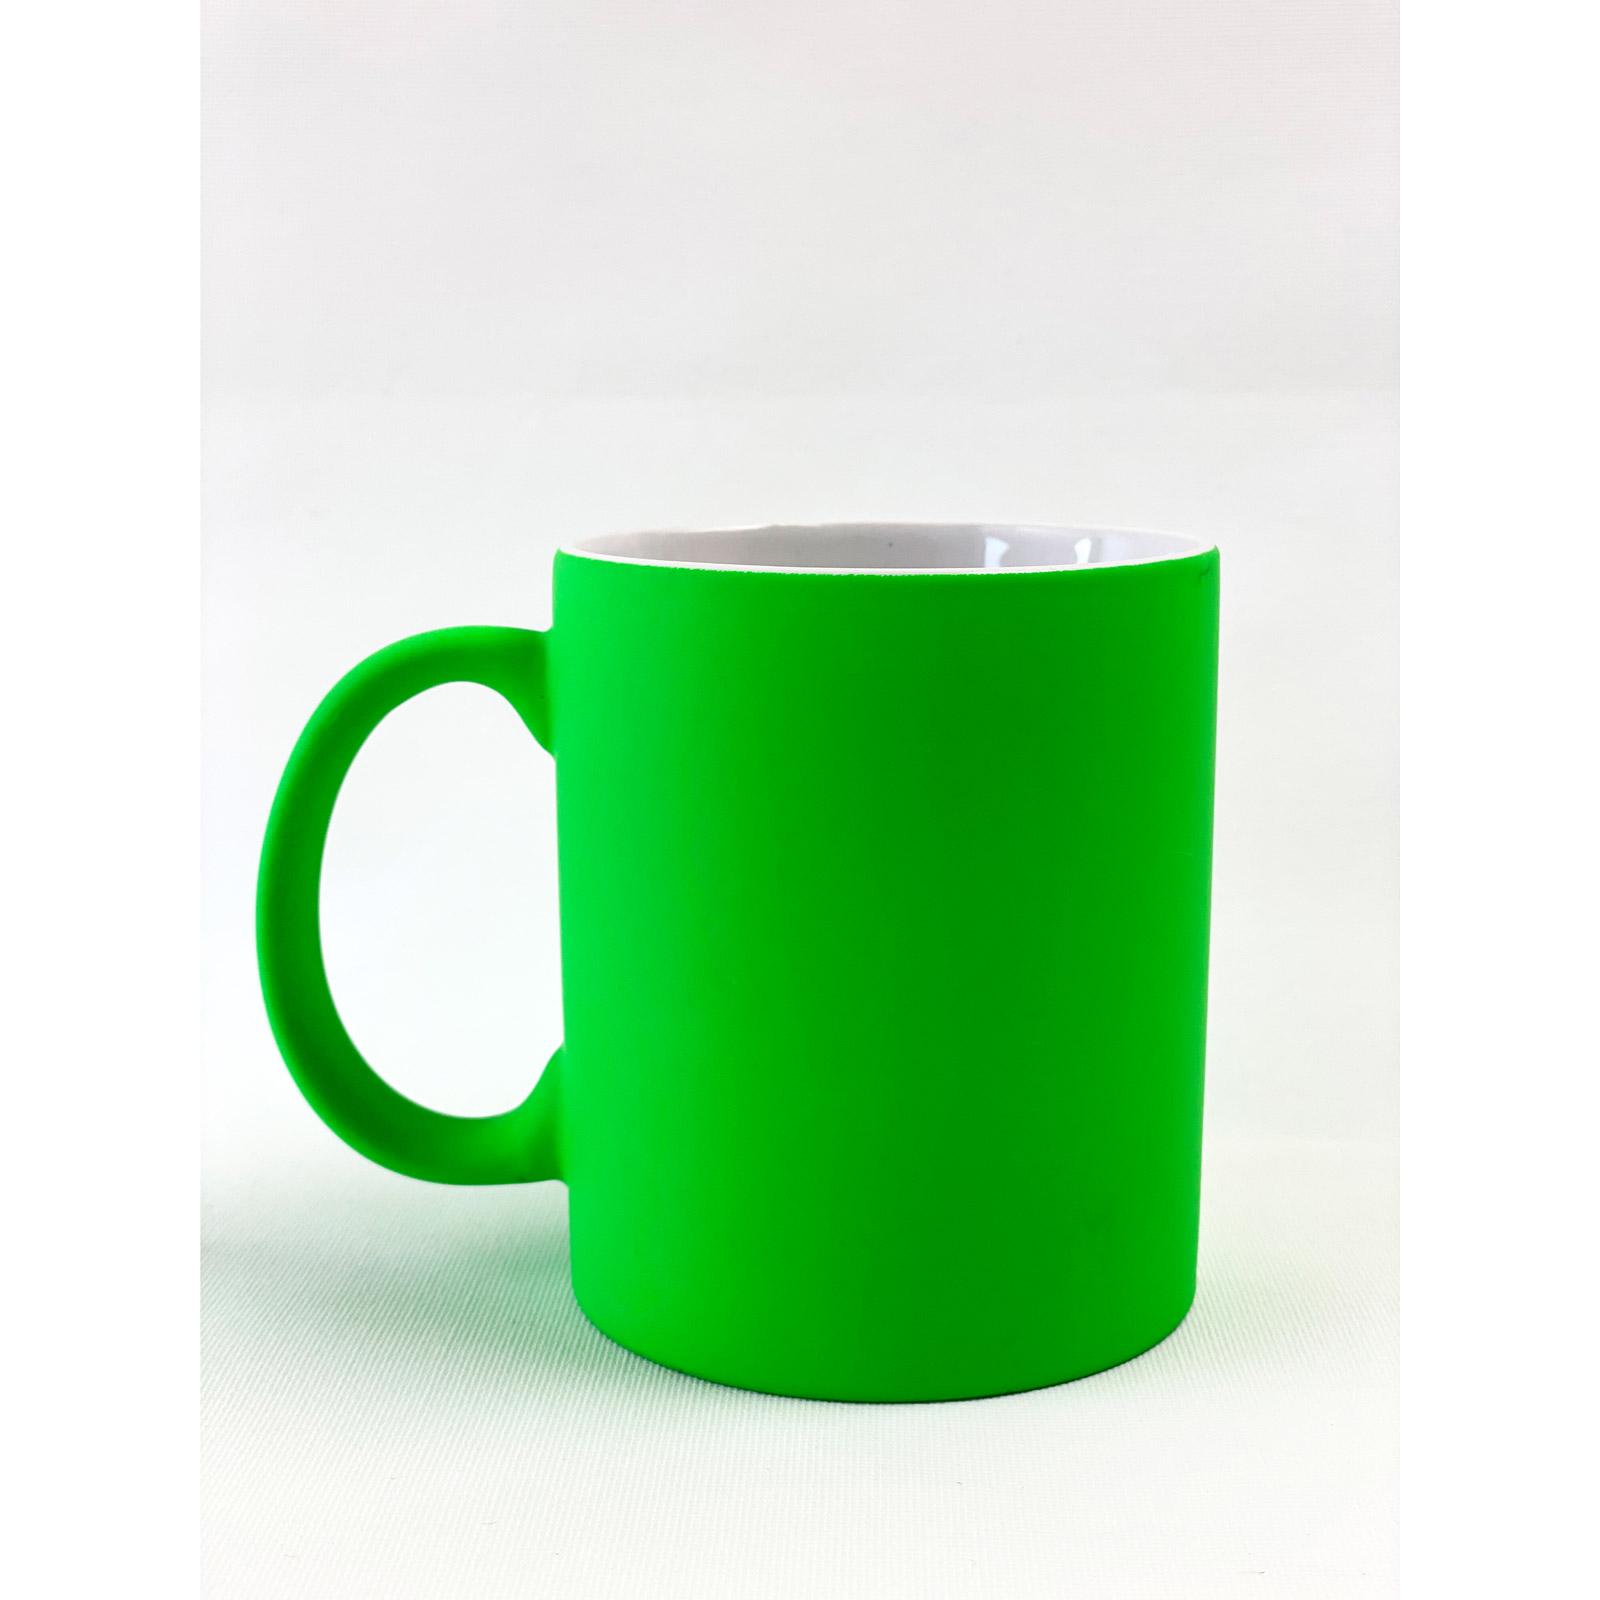 Masters of Scale Mug